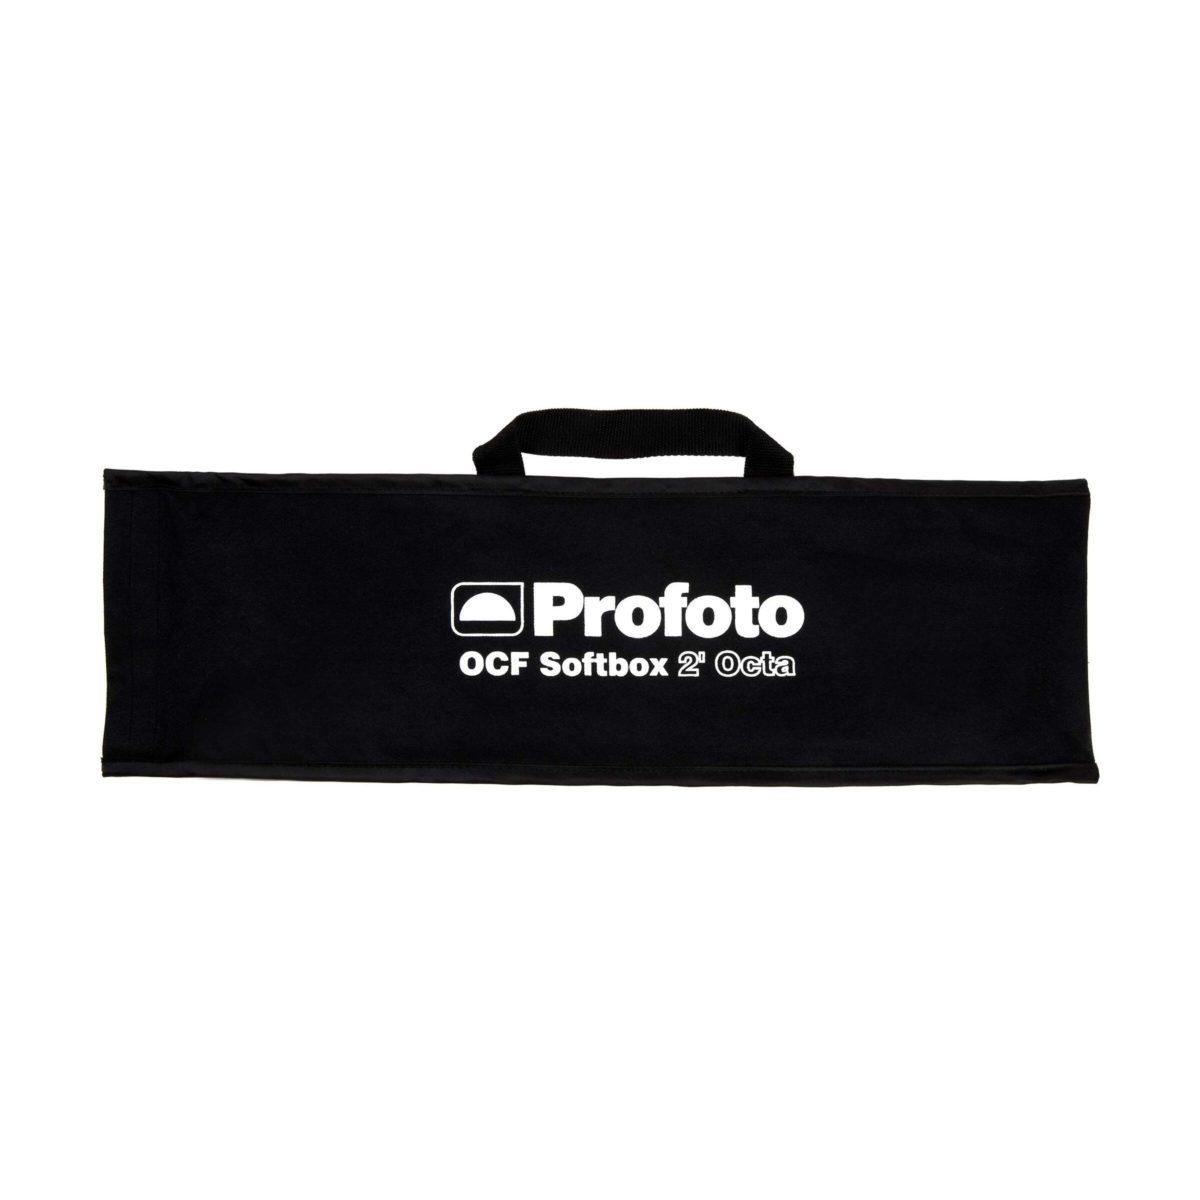 profoto_ocf_softbox_2_octa_05